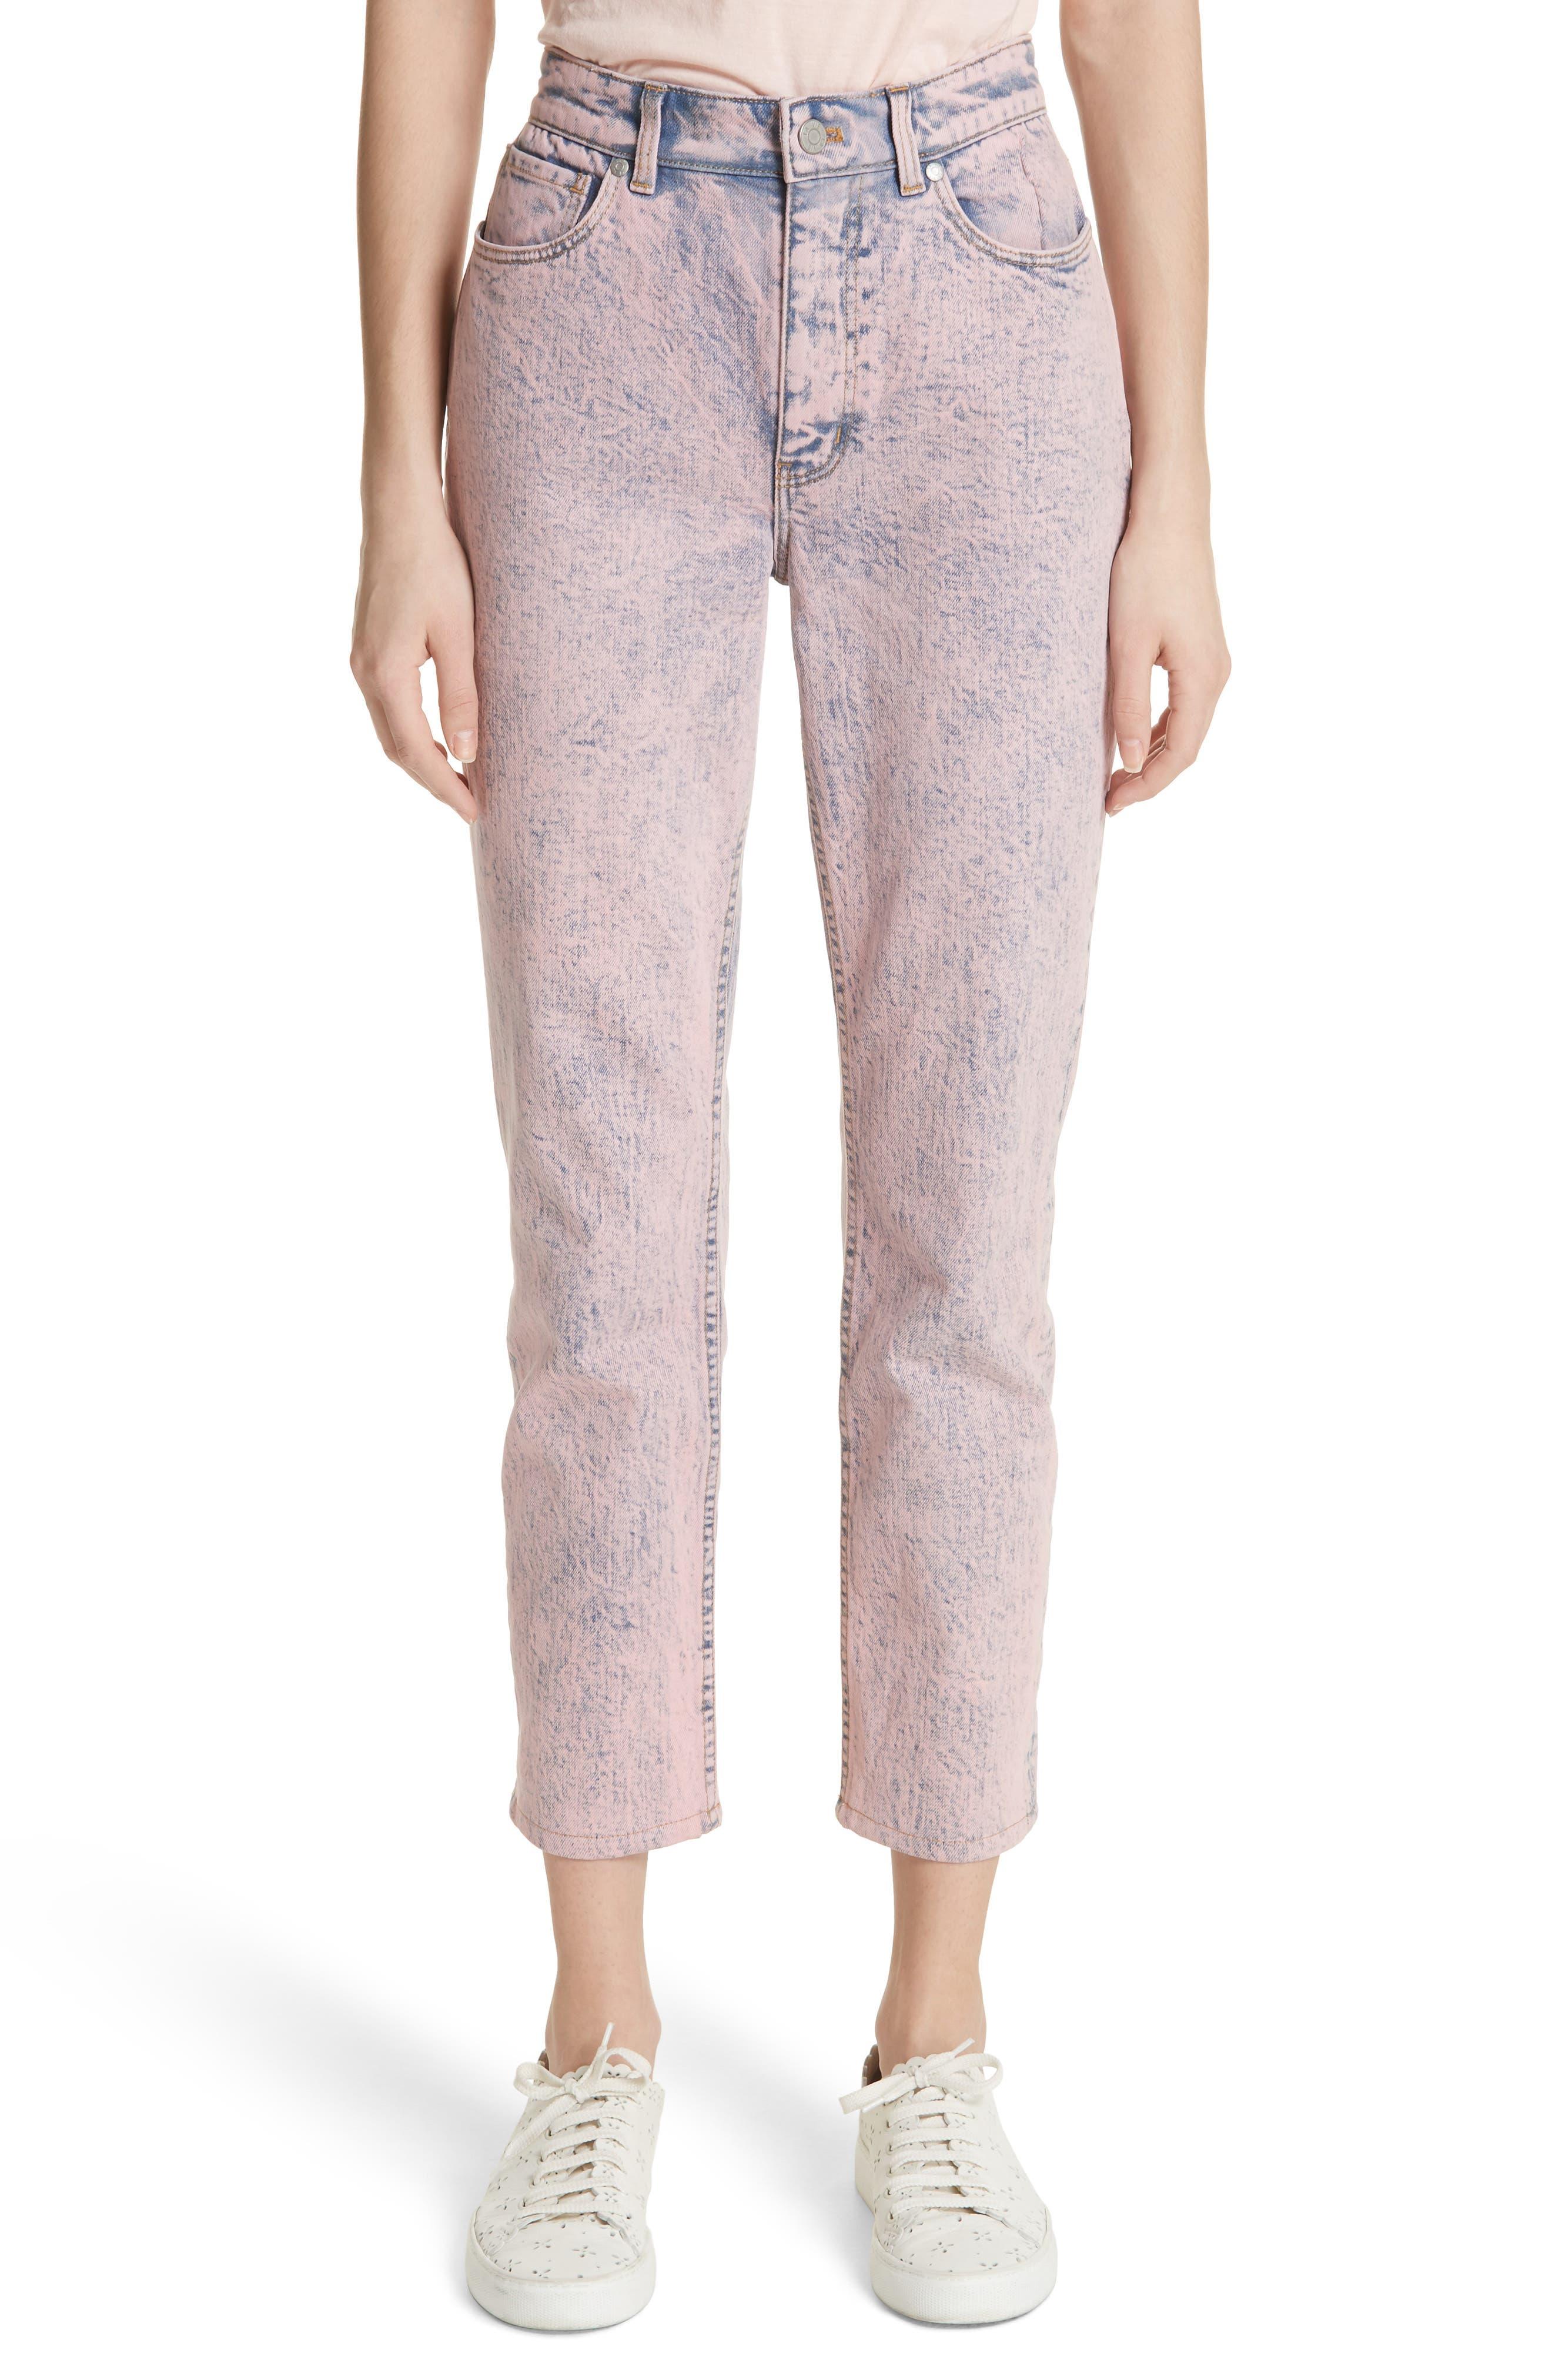 Ines Acid Wash Crop Jeans,                         Main,                         color, Pink Overdyed Acid Wash